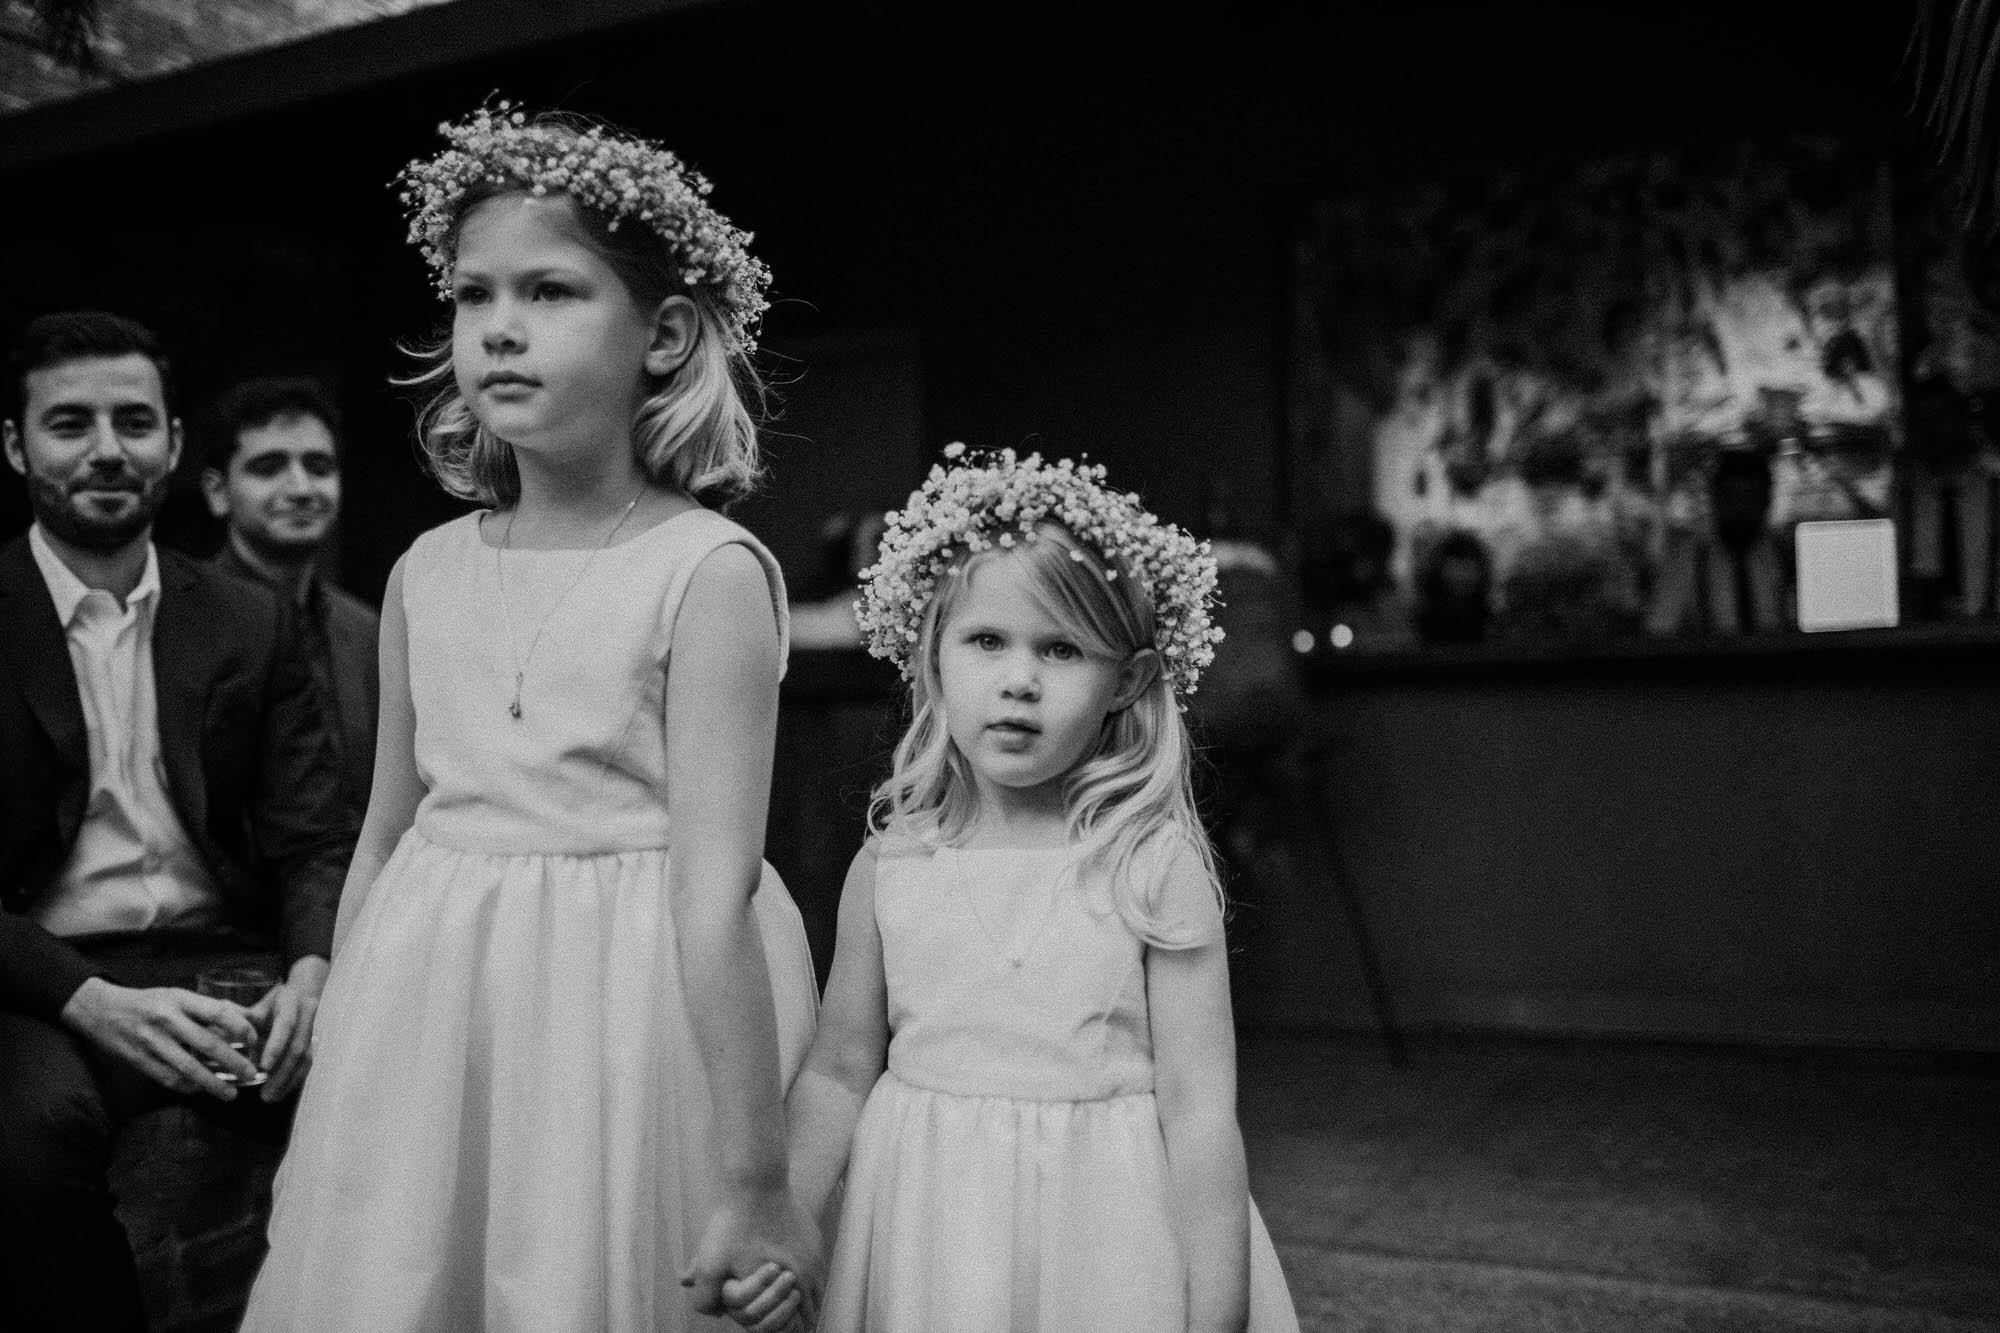 los-angeles-wedding-photographer-millwick-96.jpg